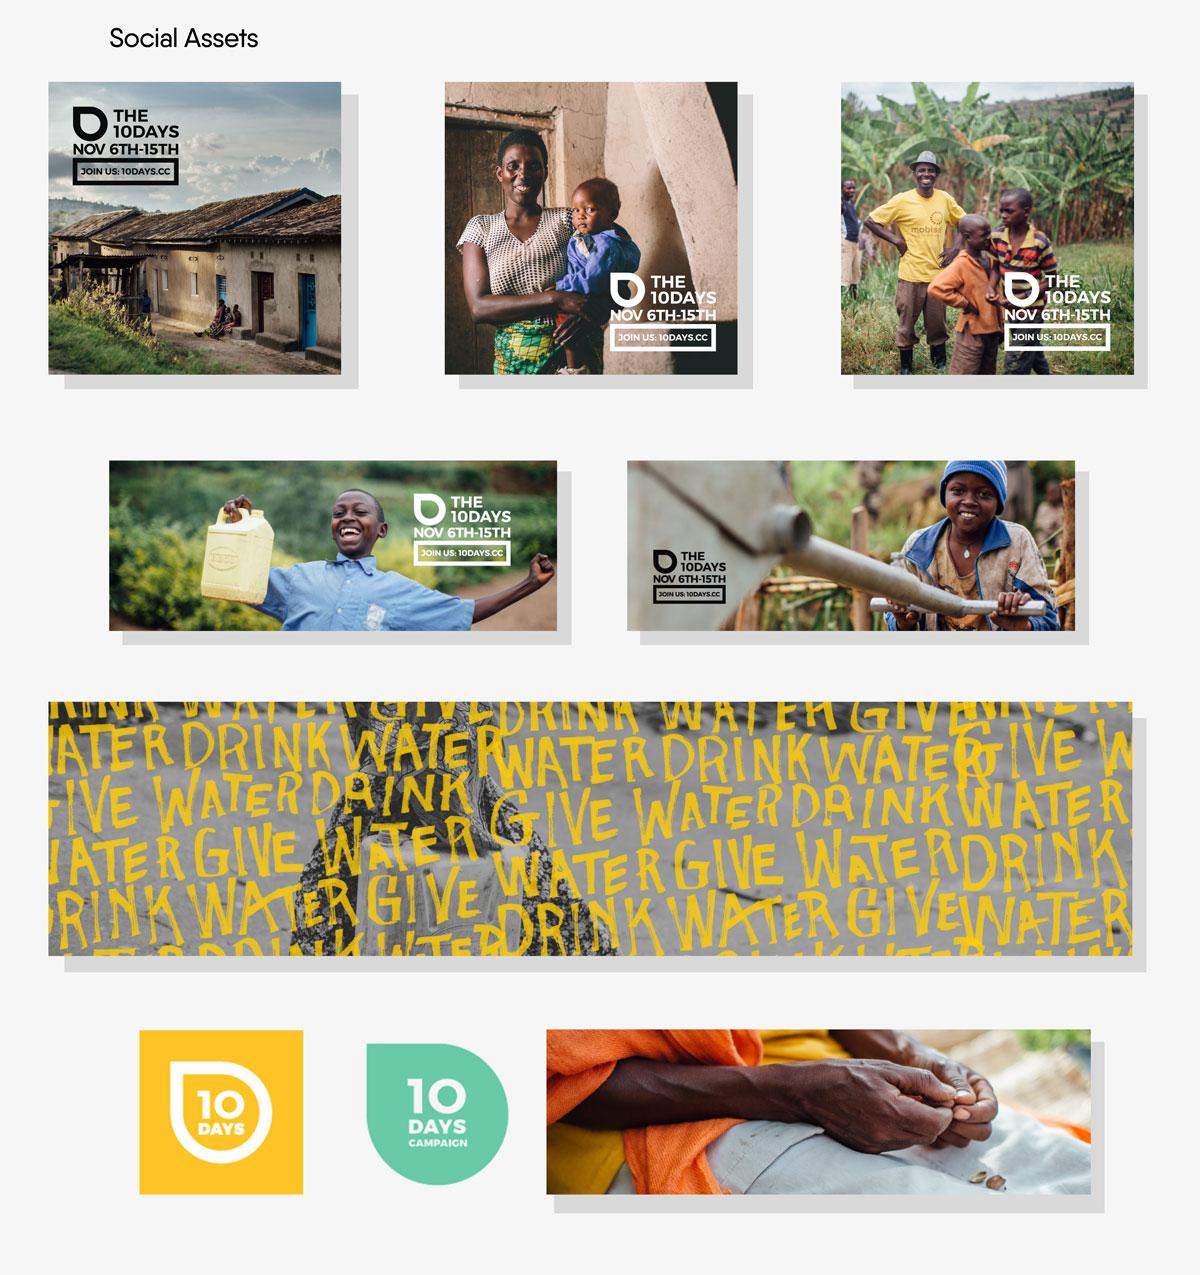 social-assets-10-days.jpg